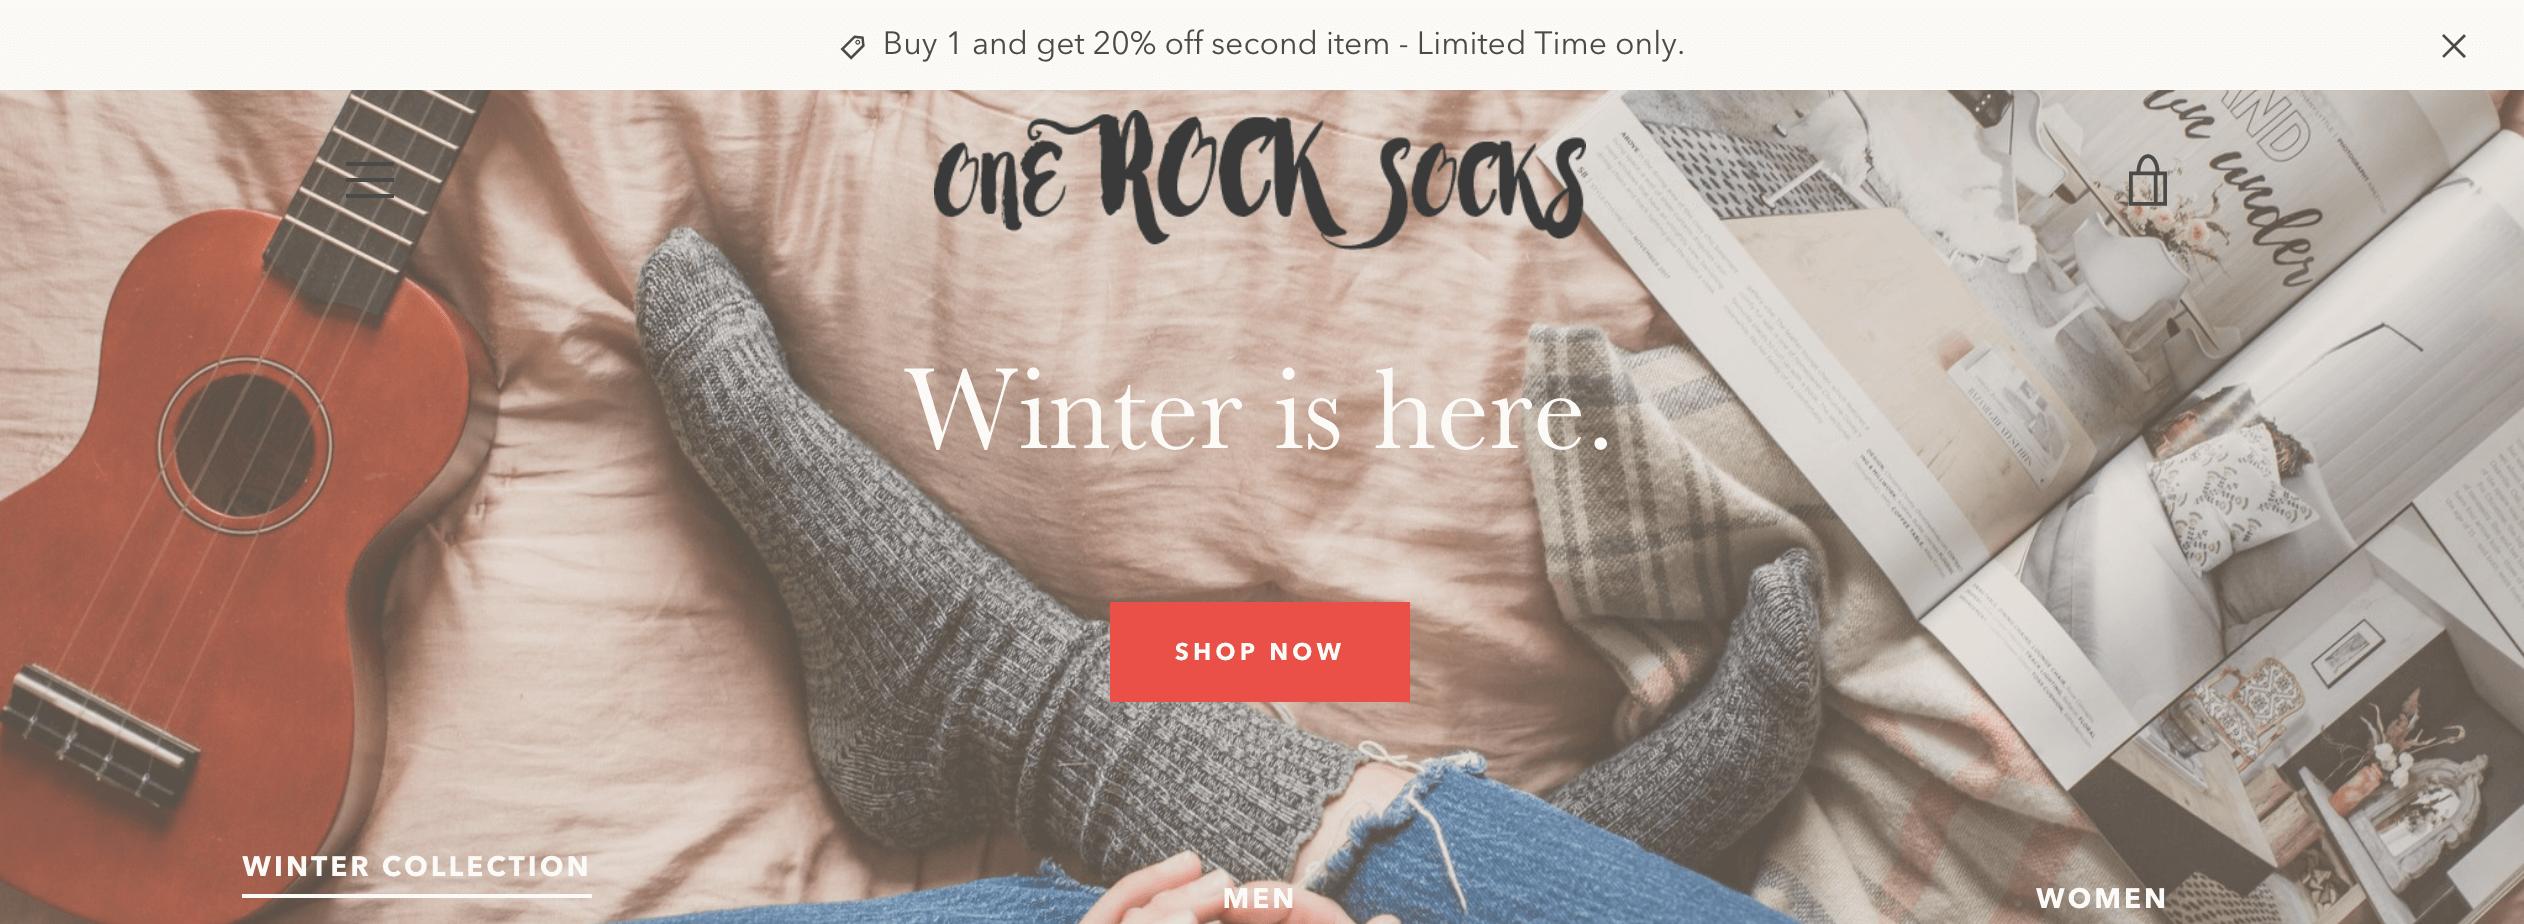 One Rock Socks - Priscilla Yap